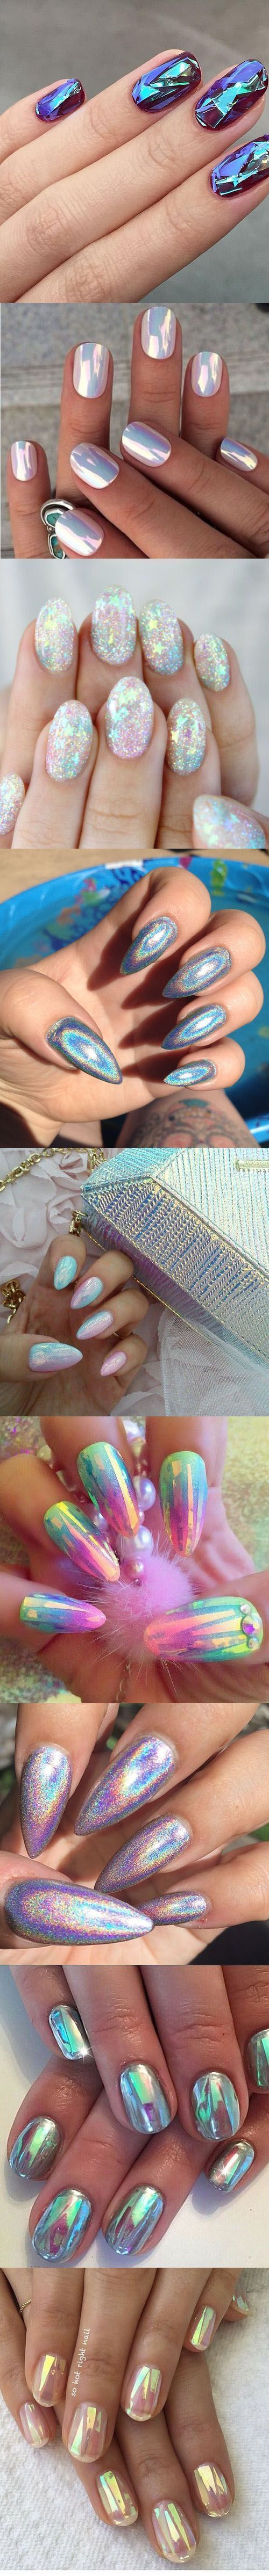 Diseños de uñas muy coloridas ideales para esta temporada http://beautyandfashionideas.com/disenos-unas-coloridas-ideales-esta-temporada/ Very colorful nail designs ideal for this season #diseñosdeuñas #Diseñosdeuñasmuycoloridasidealesparaestatemporada #ideasdeuñas #Nails #nailsdesing #uñas